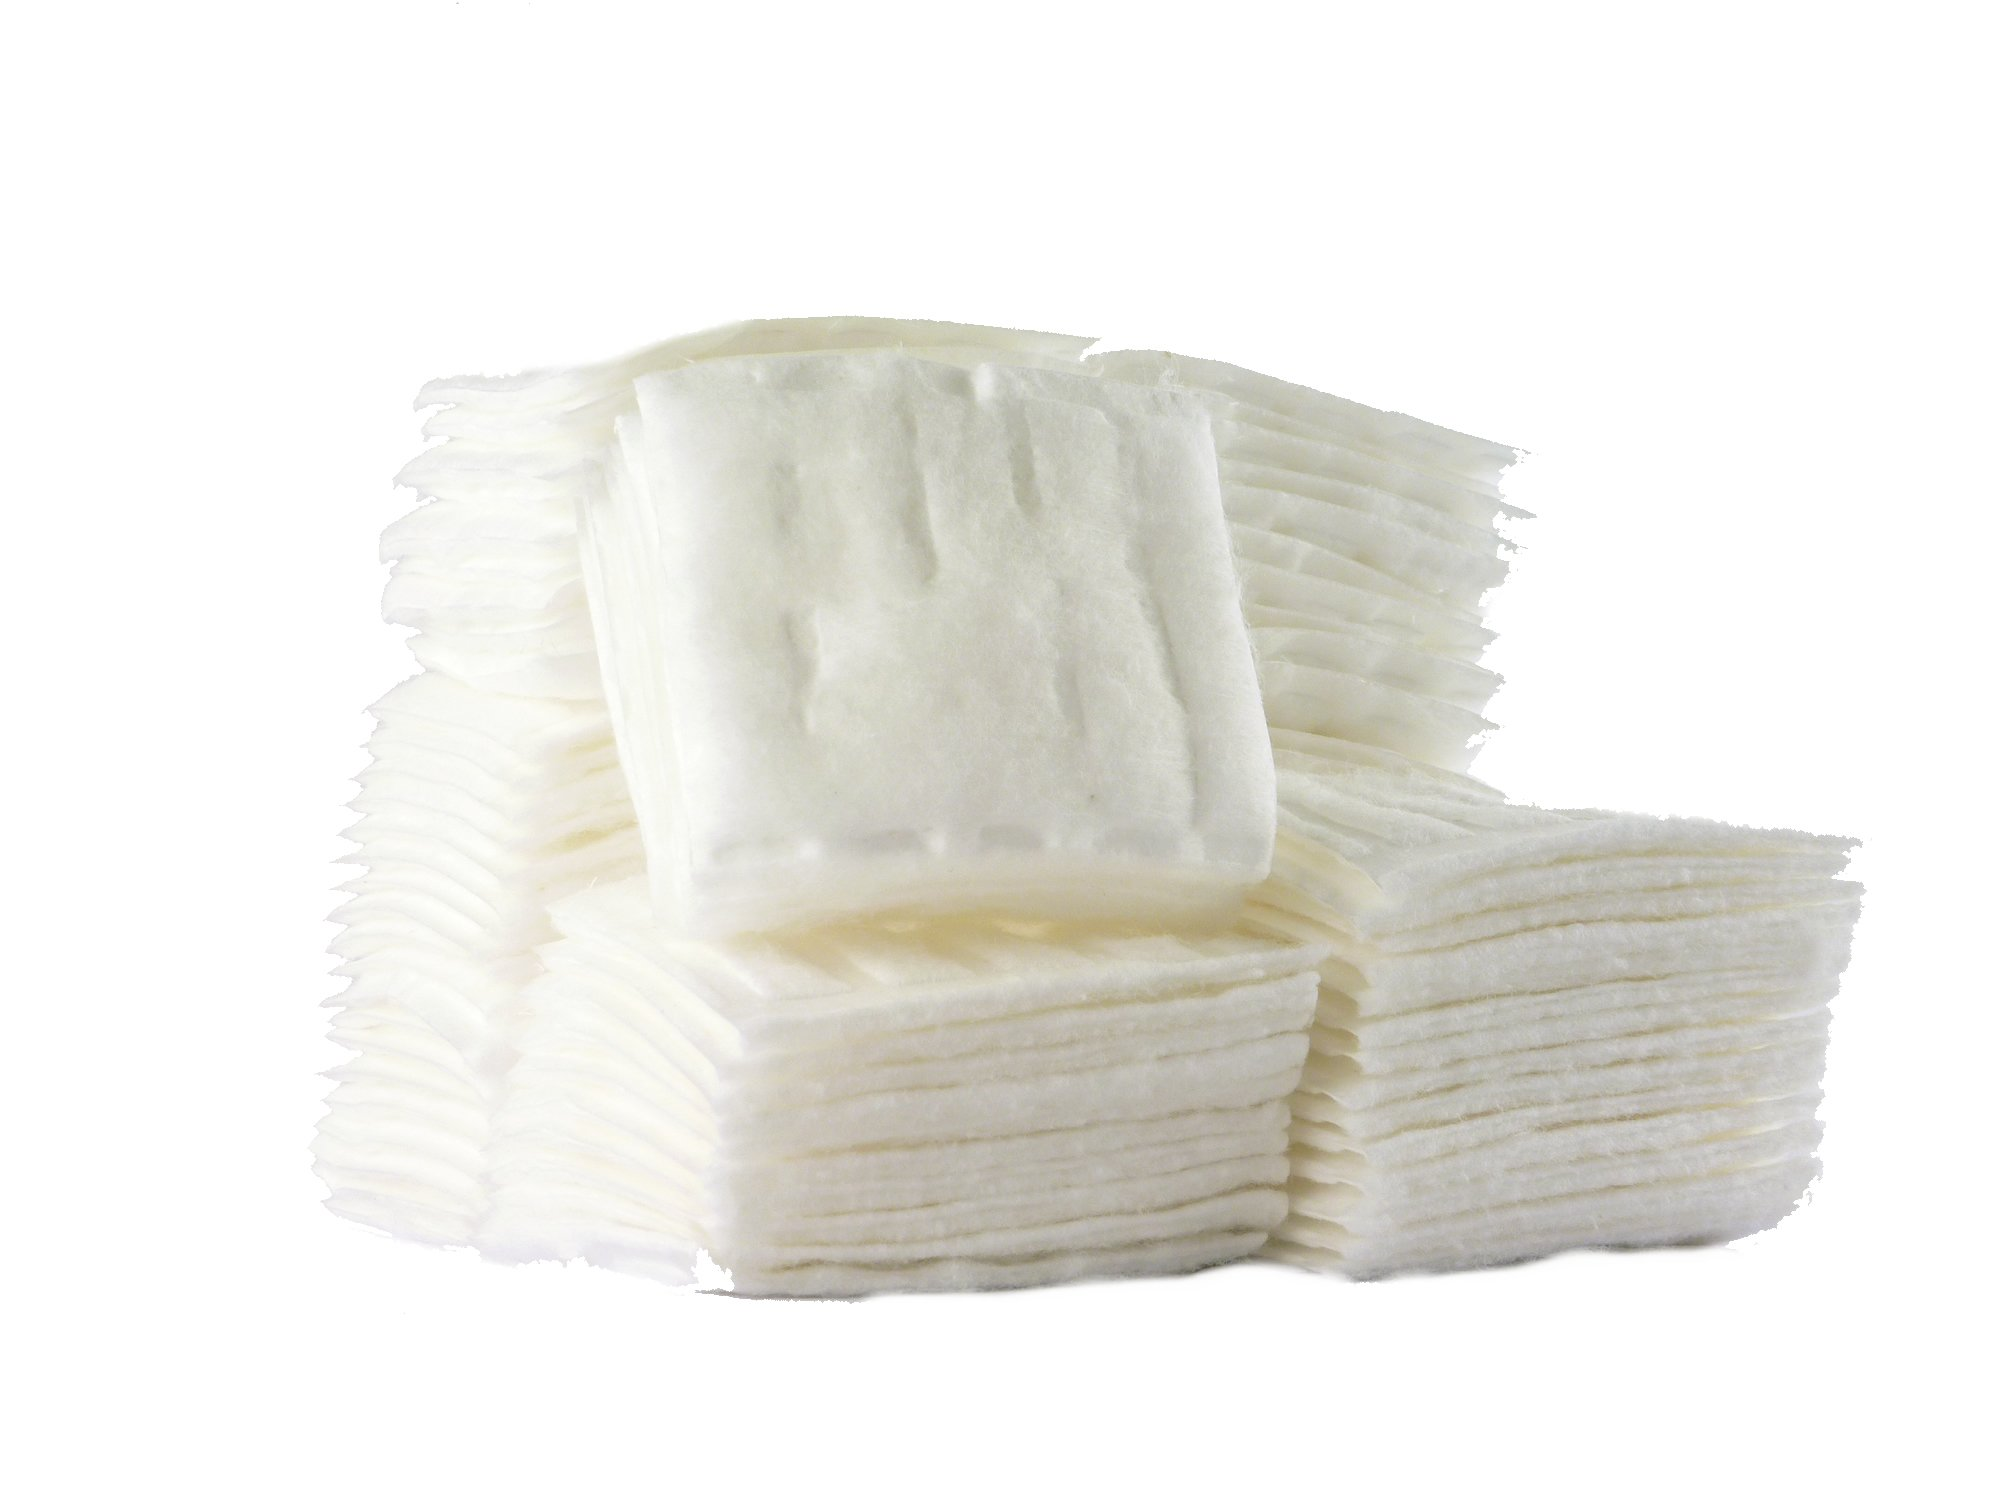 Cotton Squares, Cotton Pad Squares, 100% Cotton, 480 pieces (80 pieces, 6 packs)